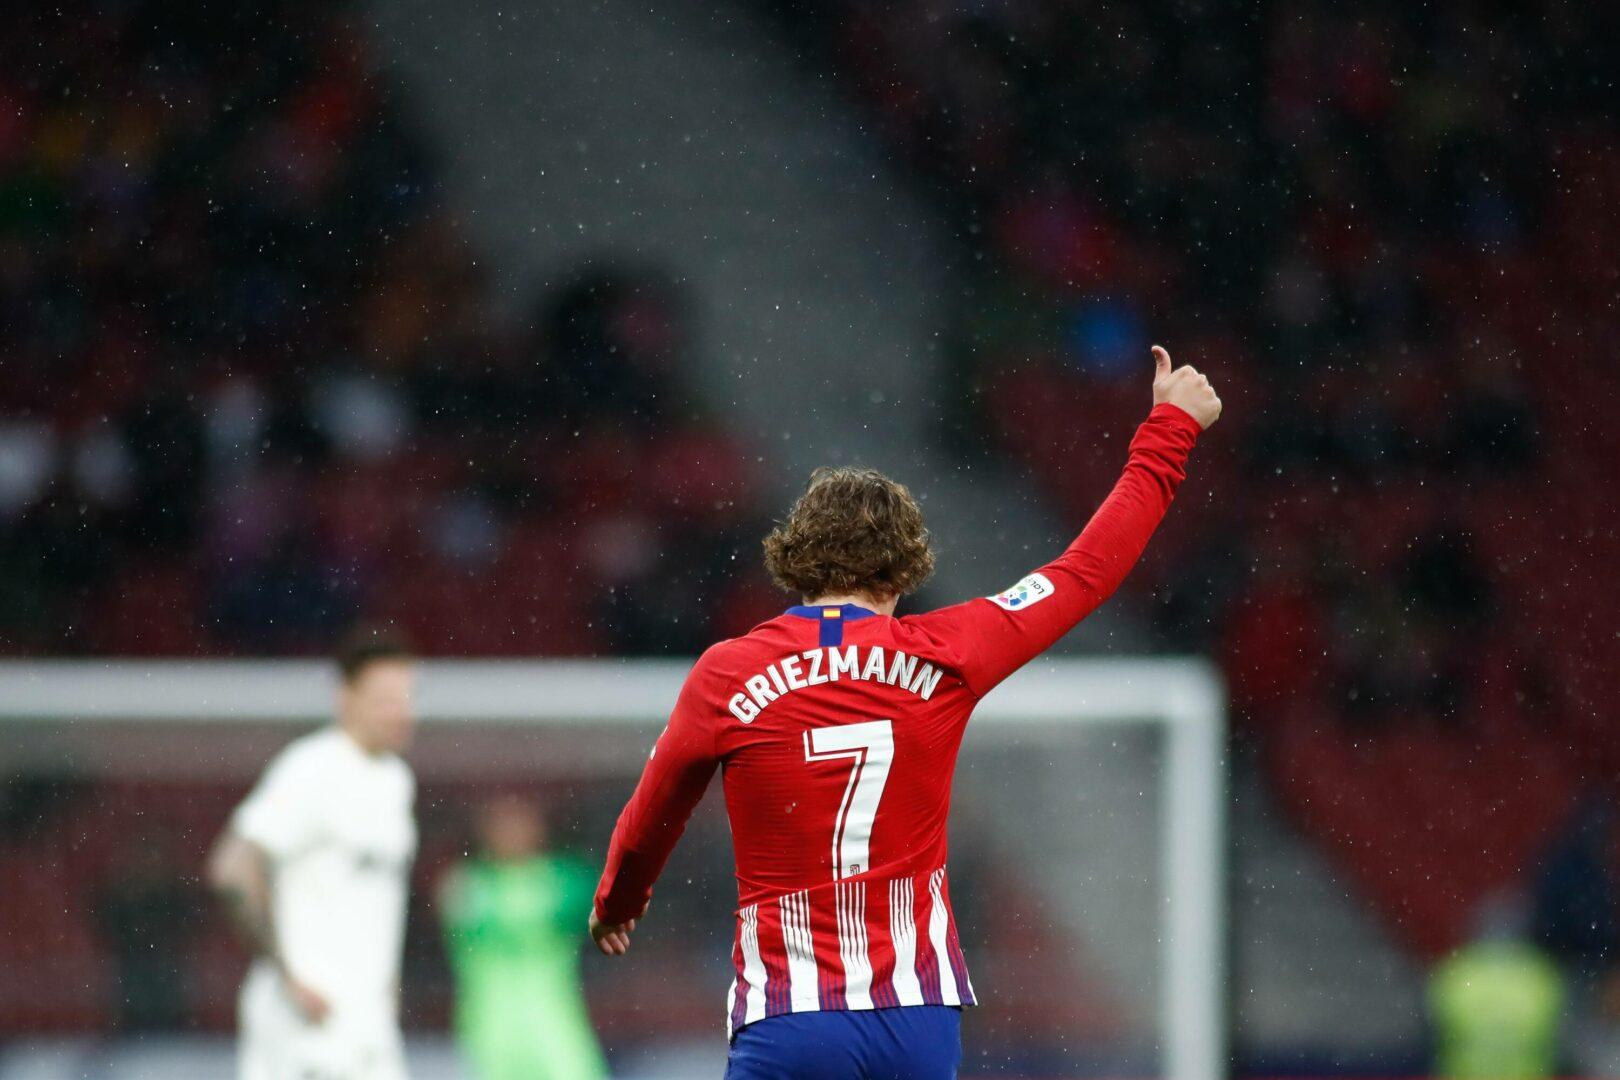 Griezmann (Atlético) reckt den Daumen